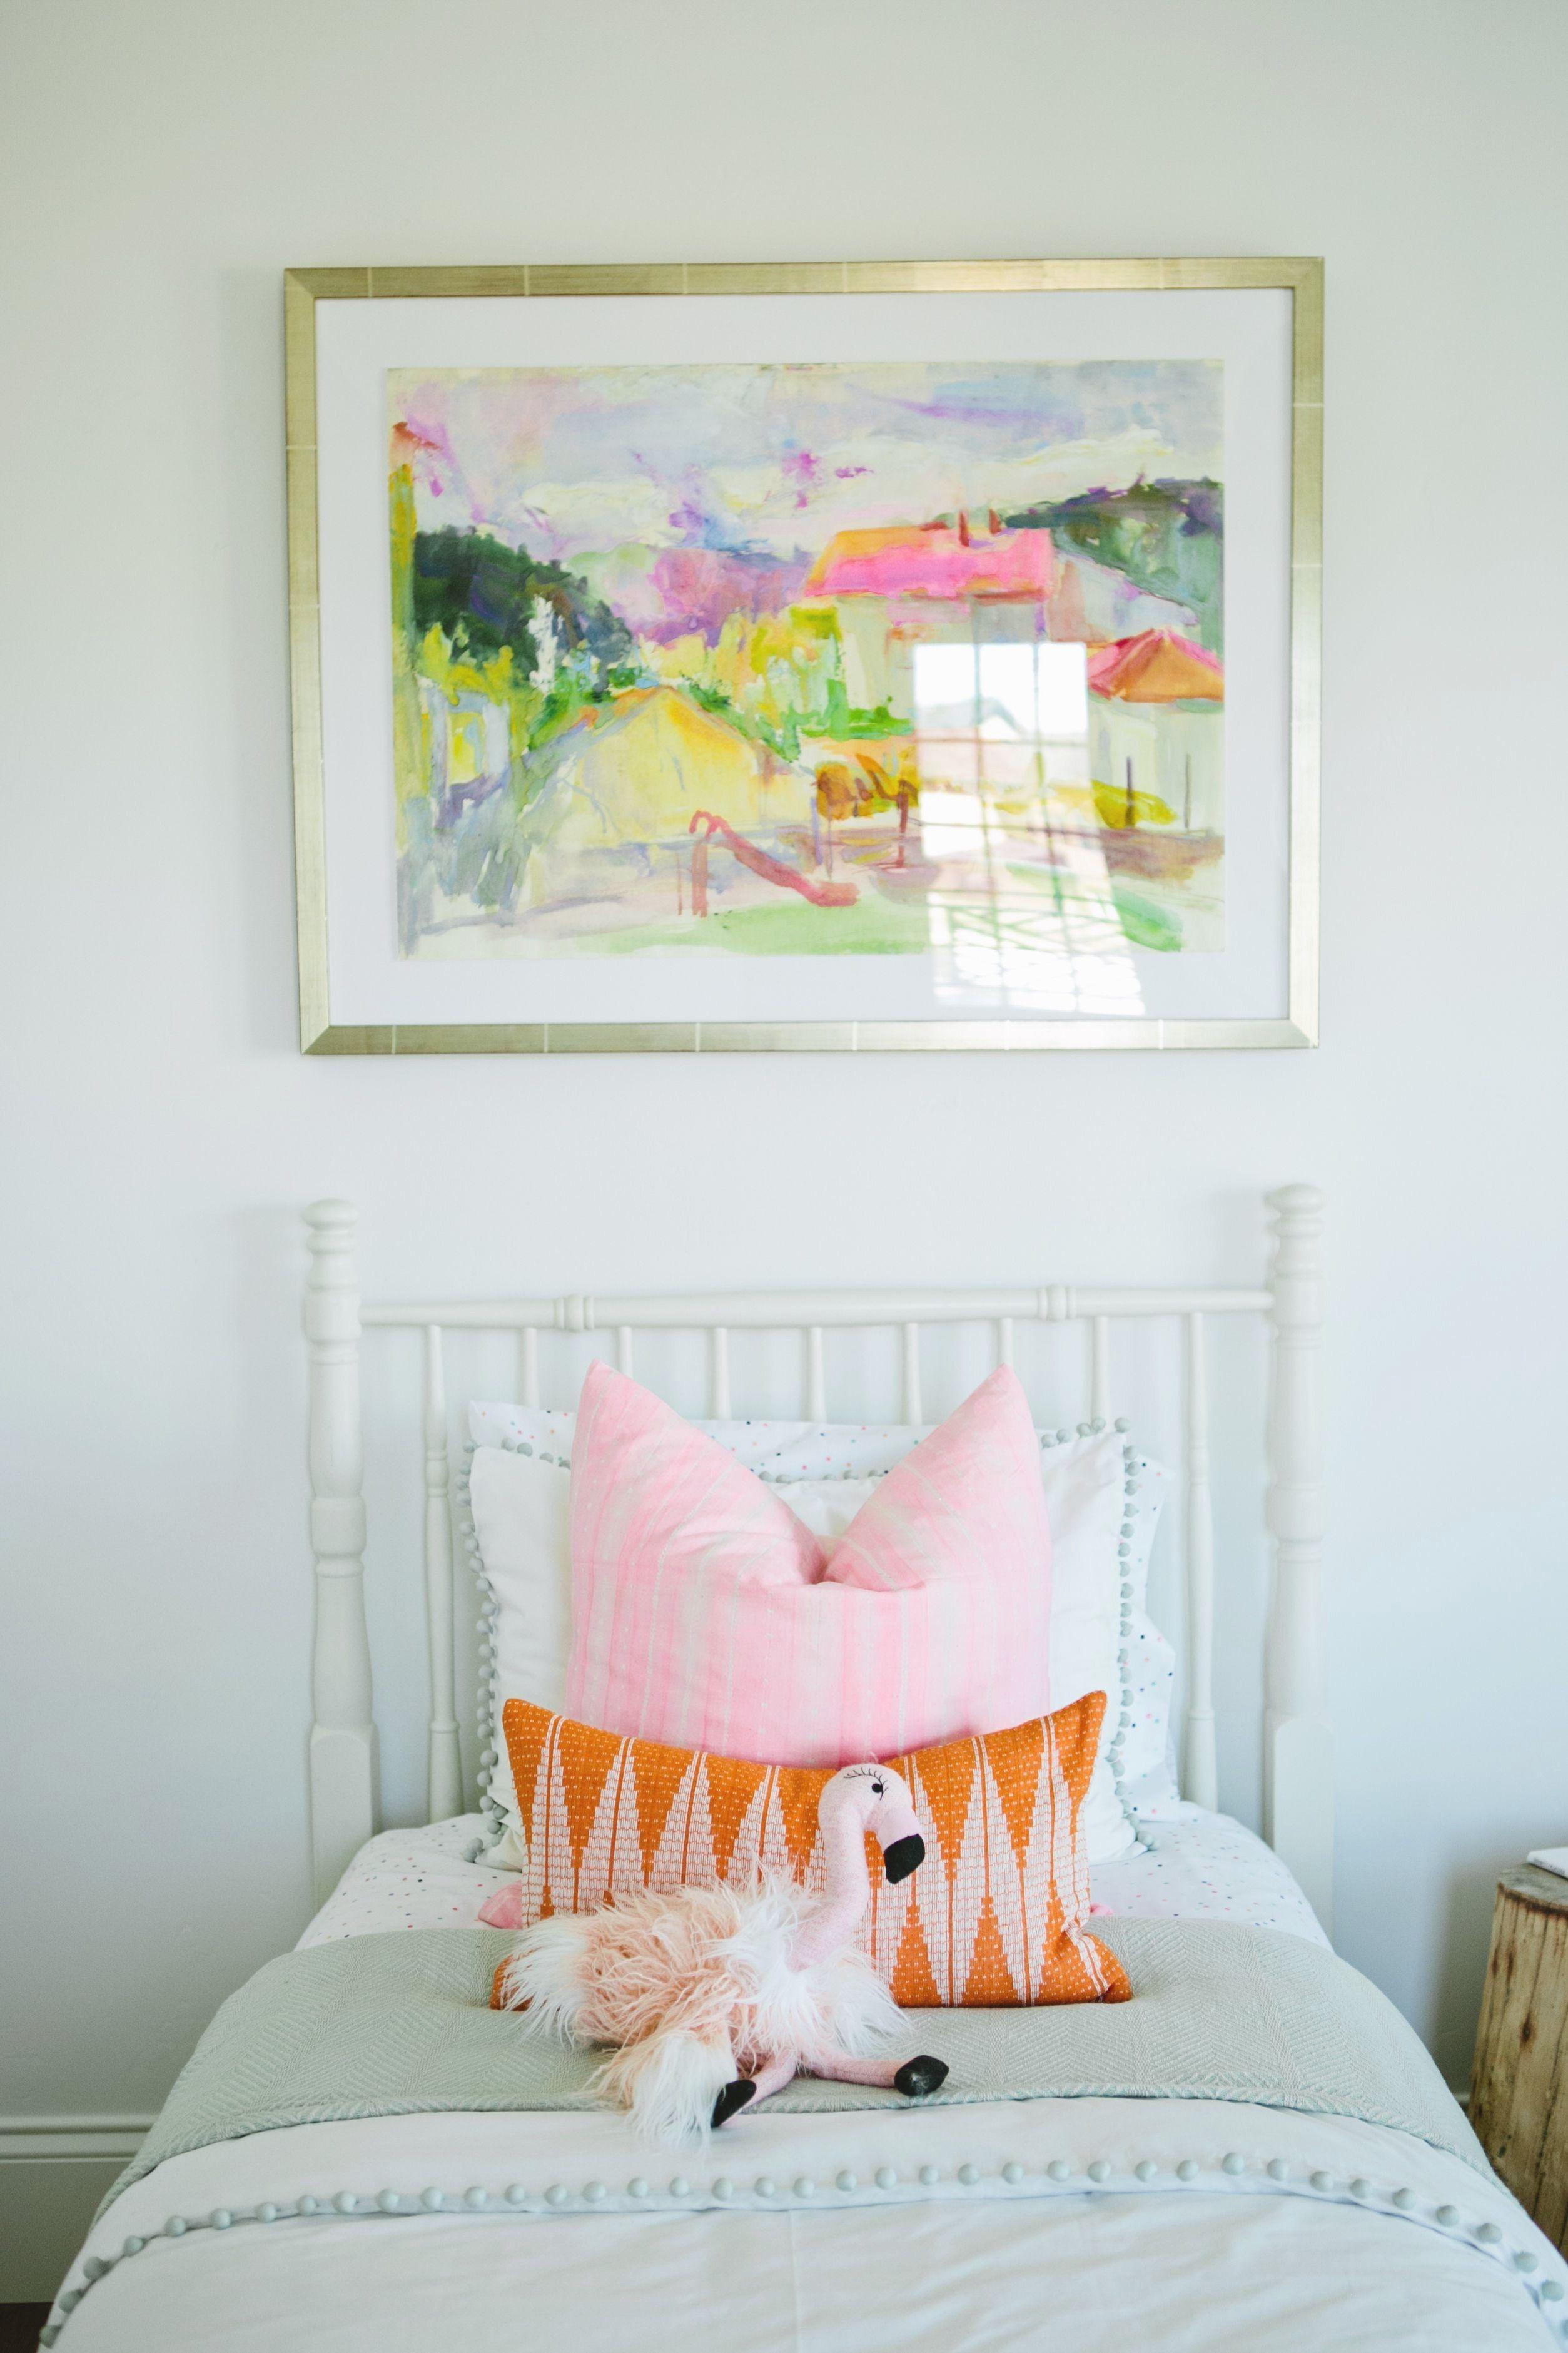 27 Childrens Bedroom Wallpaper Ideas it Making Cool | Child Bedroom ...